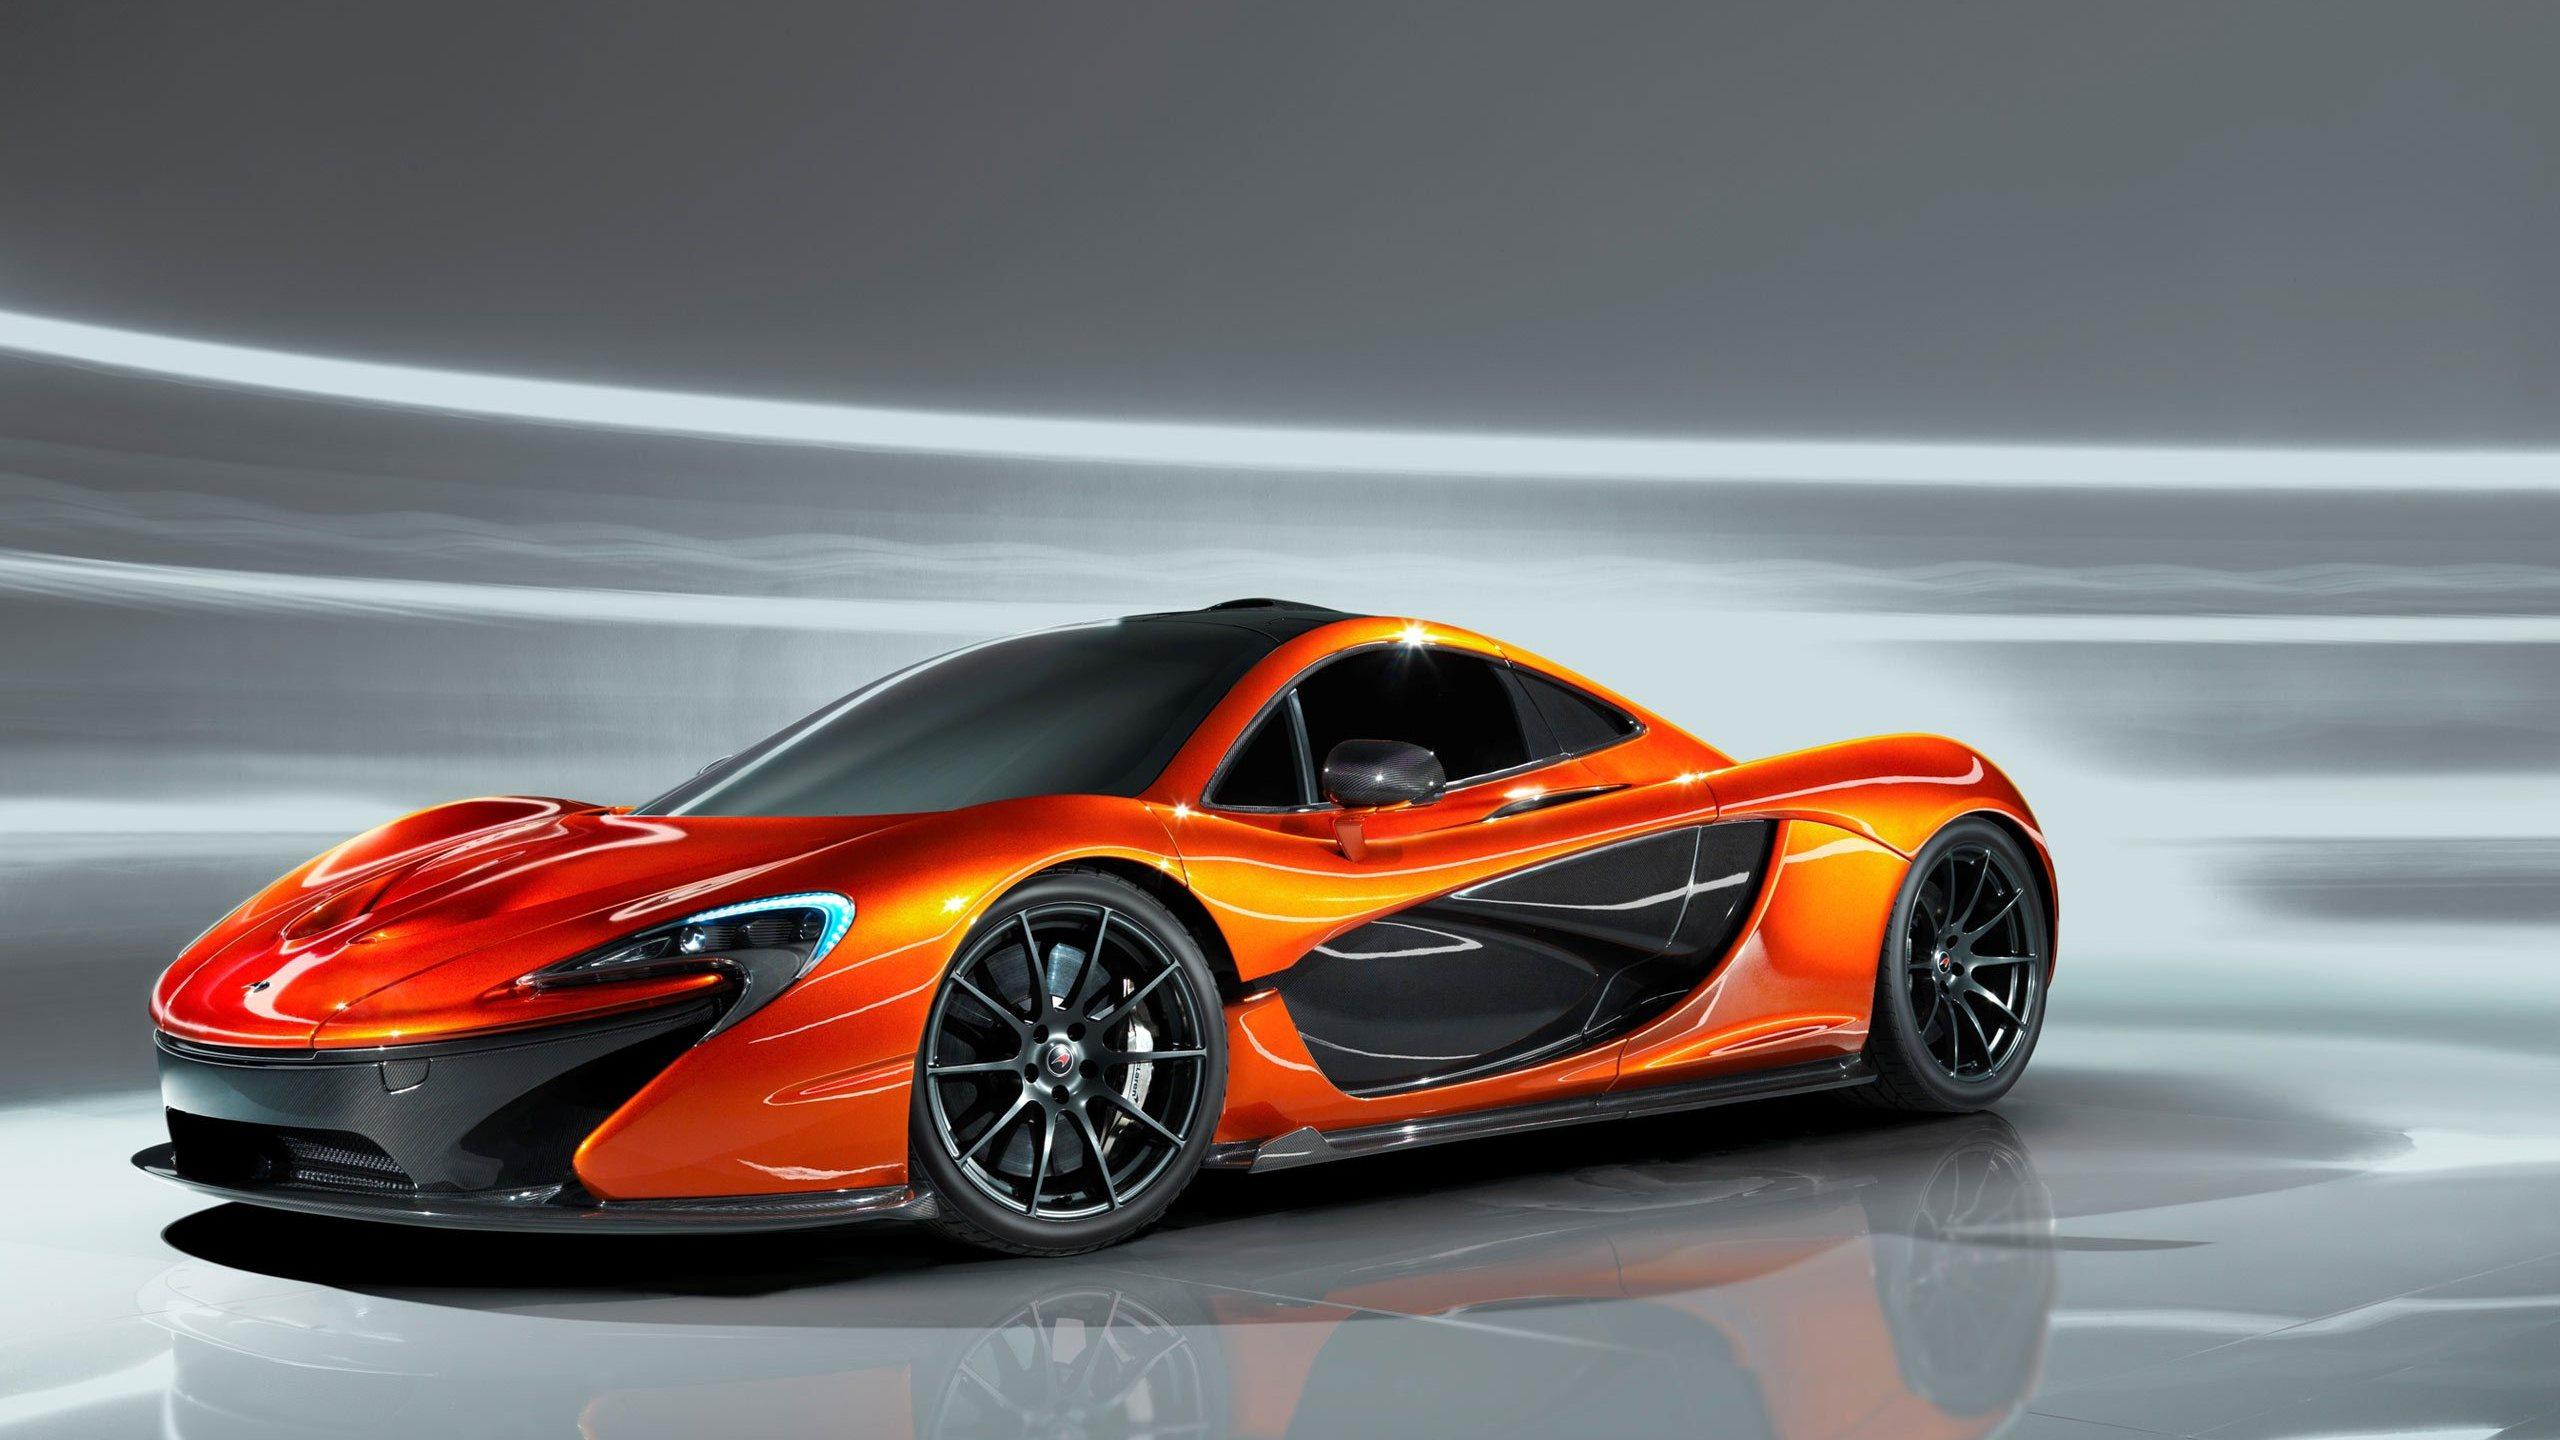 Super Cars 2014 HD Wallpapers Pictures Desktop 2560x1440